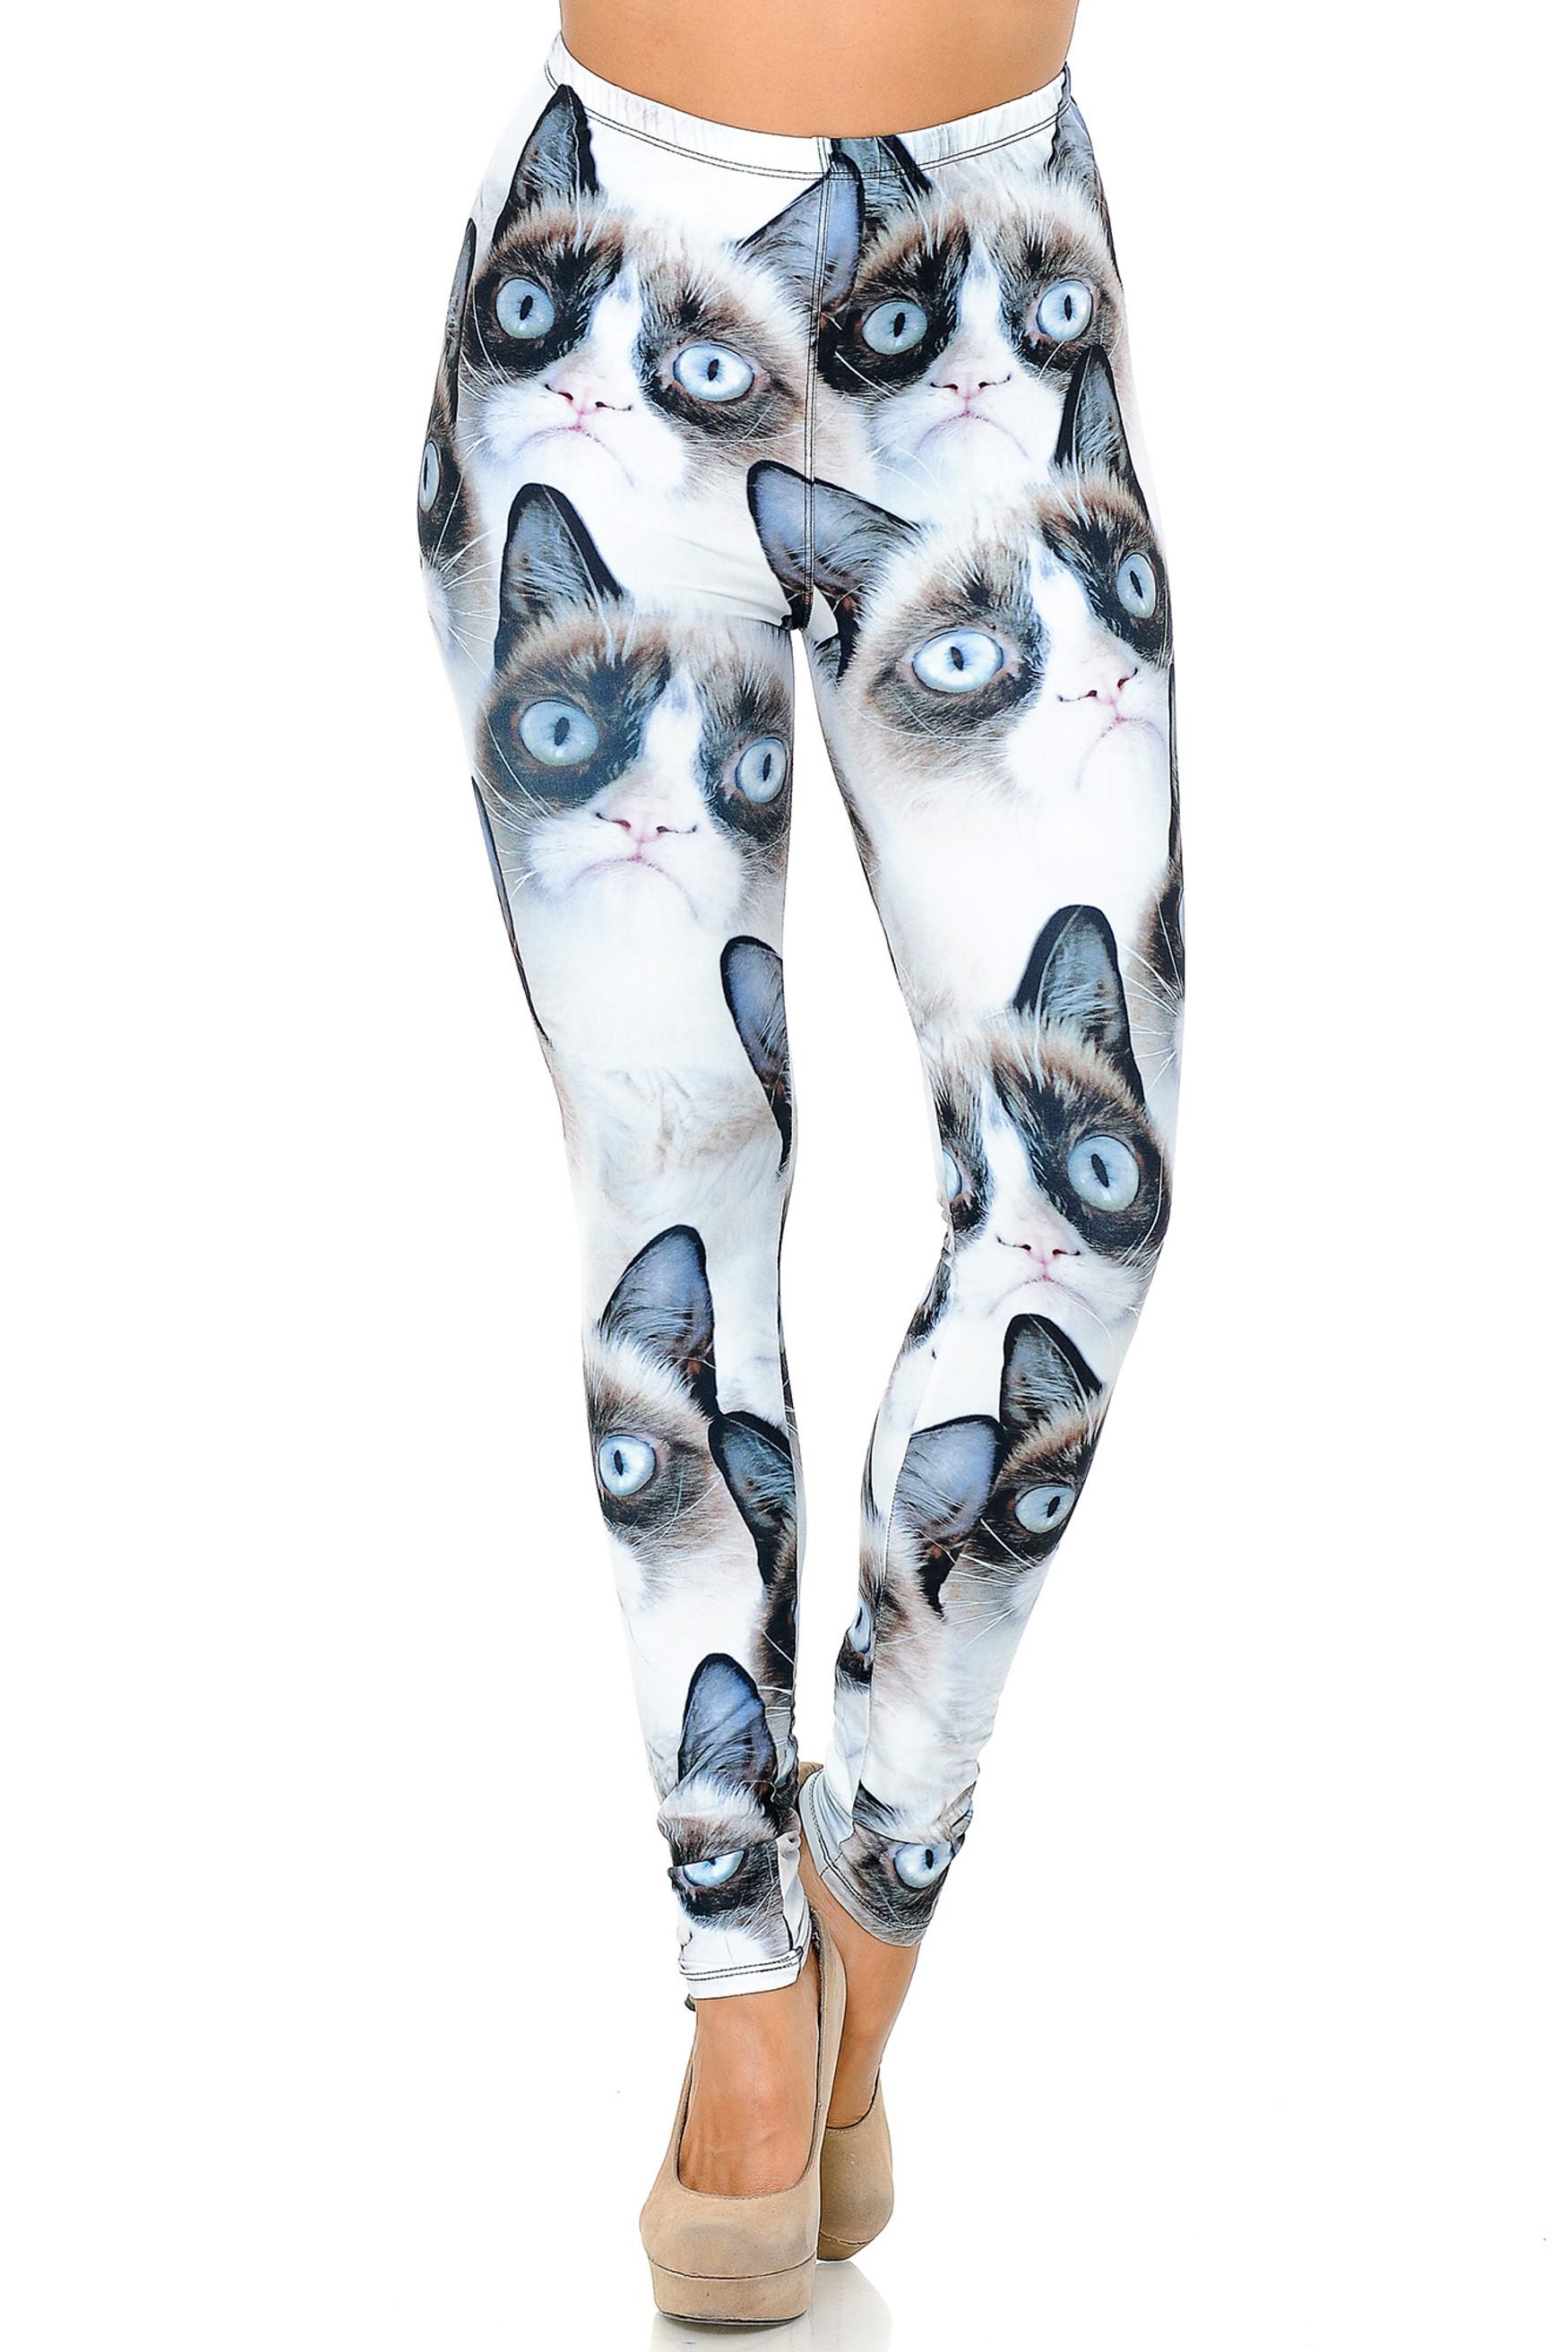 Creamy Soft Grumpy Cat Extra Plus Size Leggings - 3X-5X - USA Fashion™